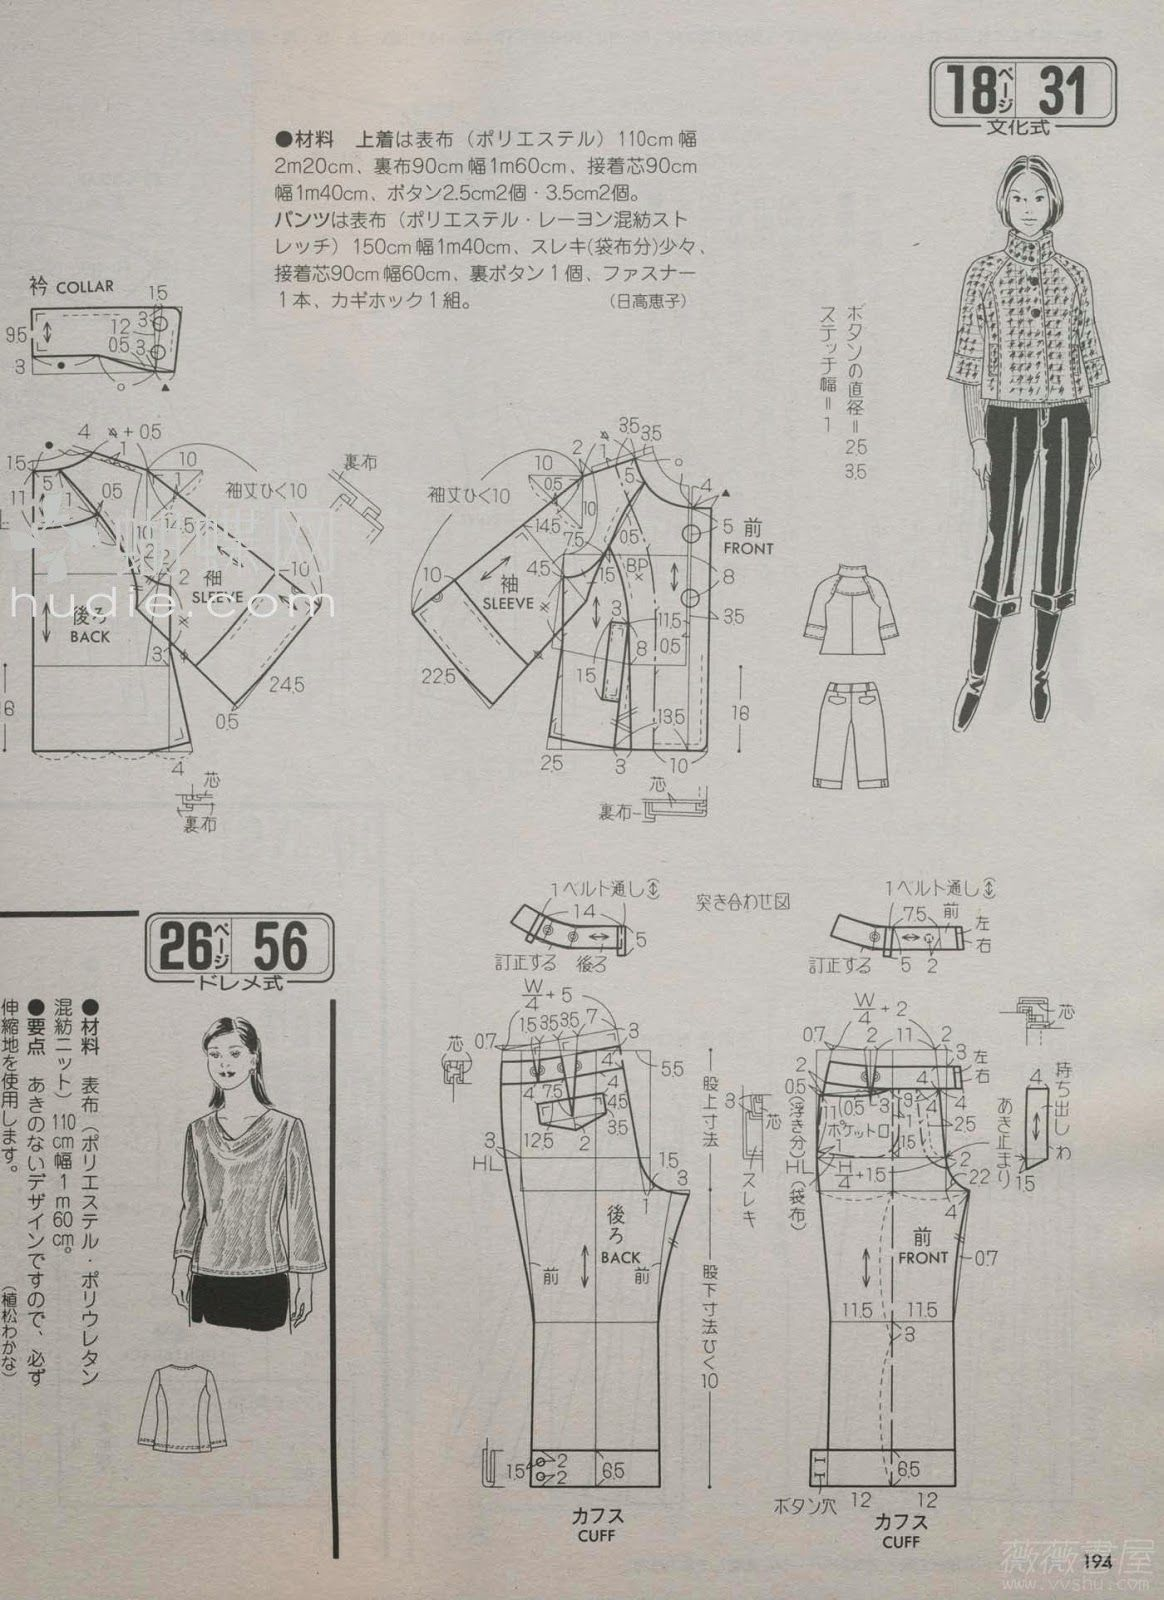 raglan sleeve varieties - modelist kitapları | 옷 | Pinterest ...